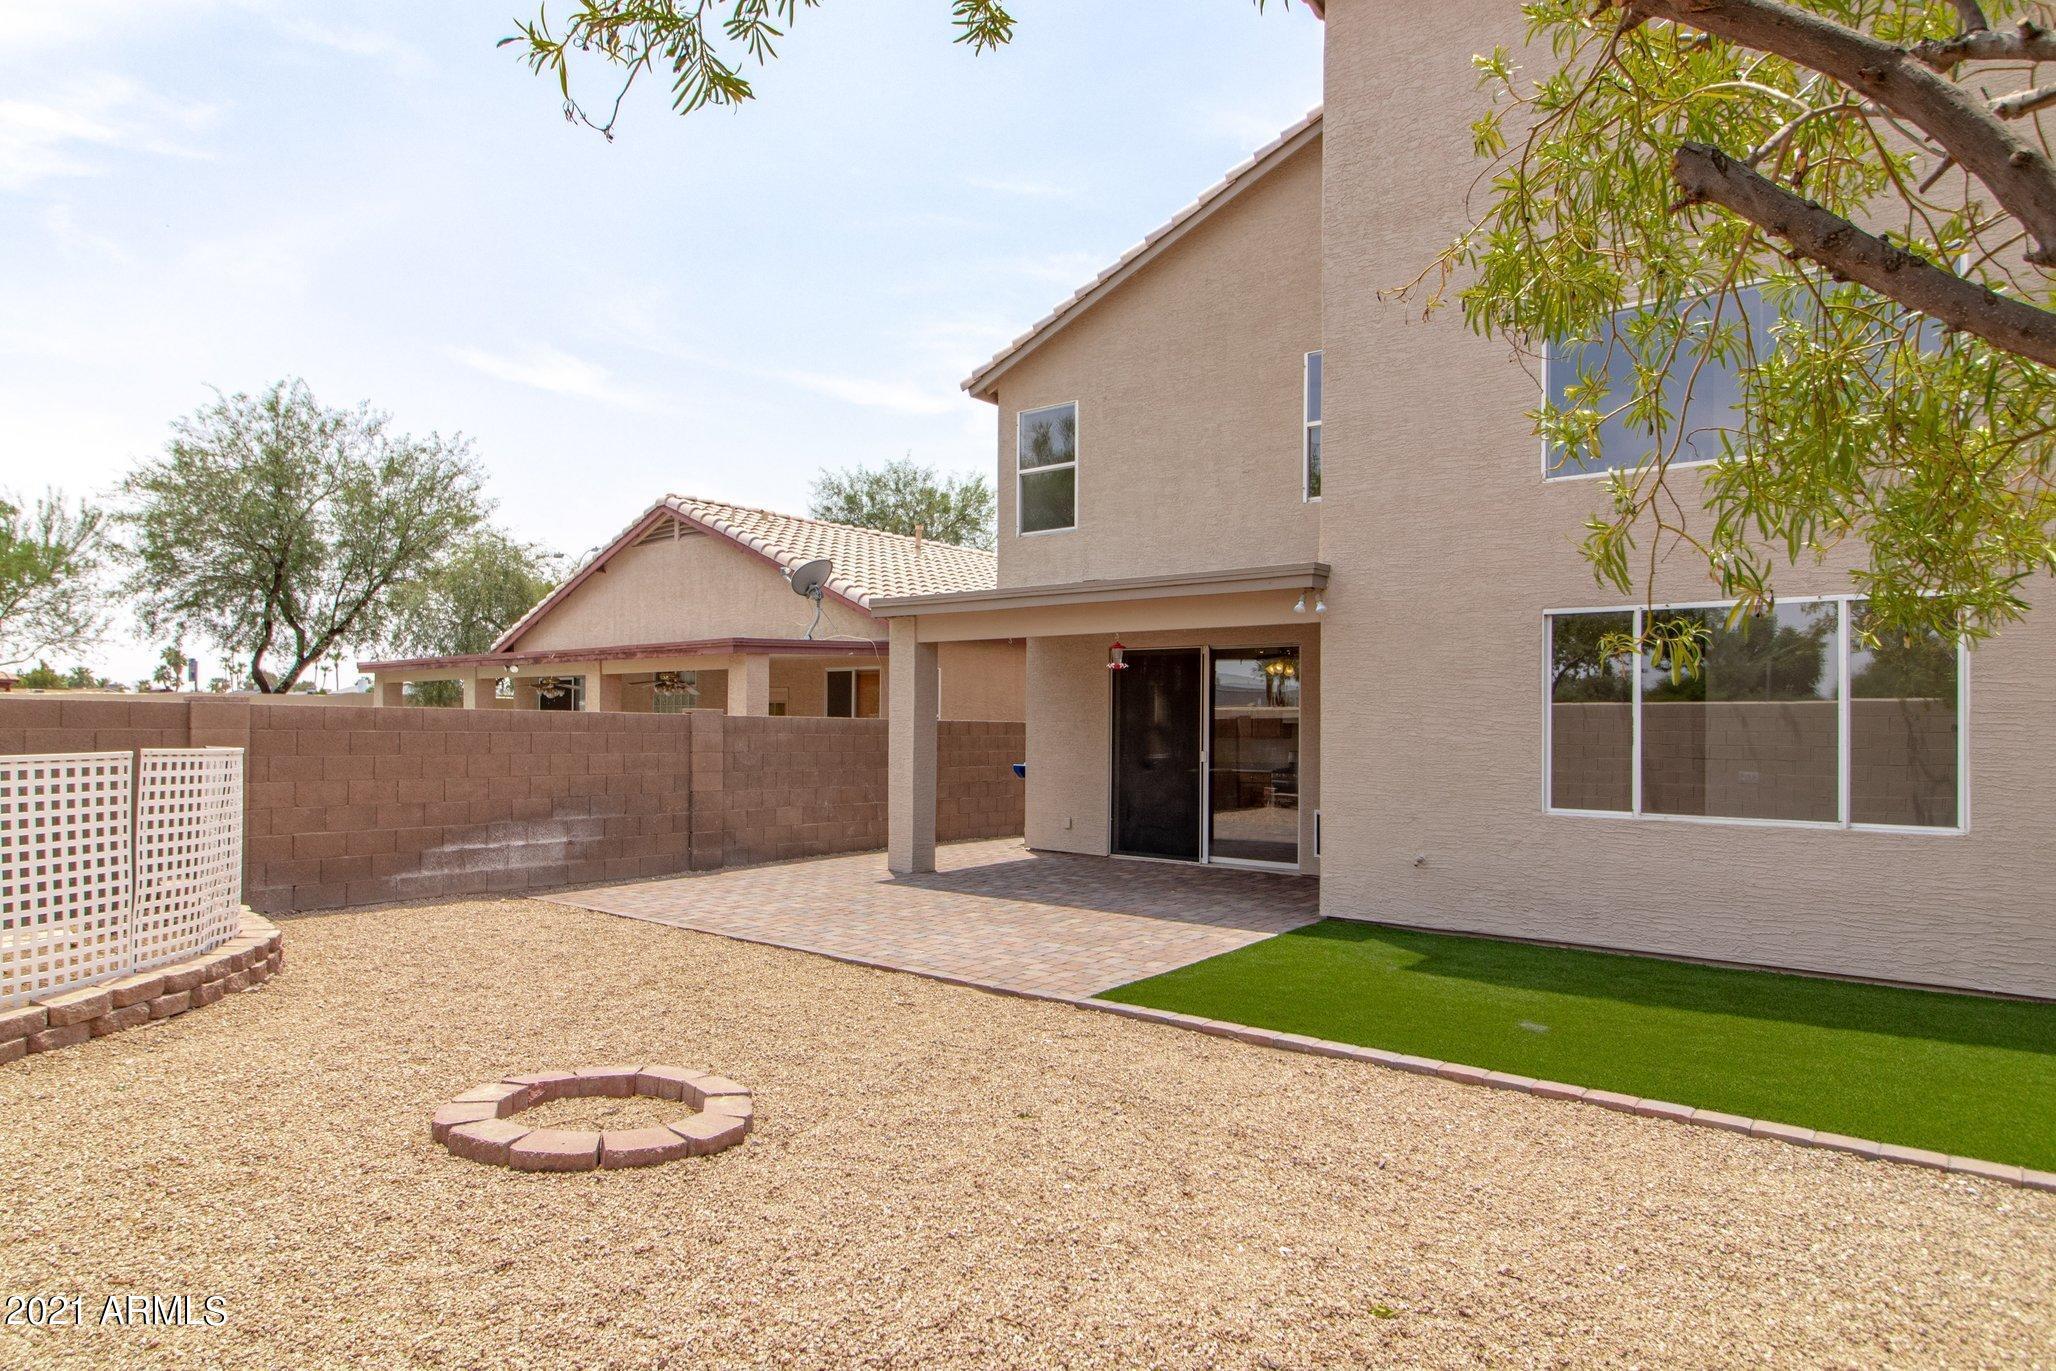 MLS 6264124 231 N KENNETH Place, Chandler, AZ 85226 Chandler AZ Wild Tree